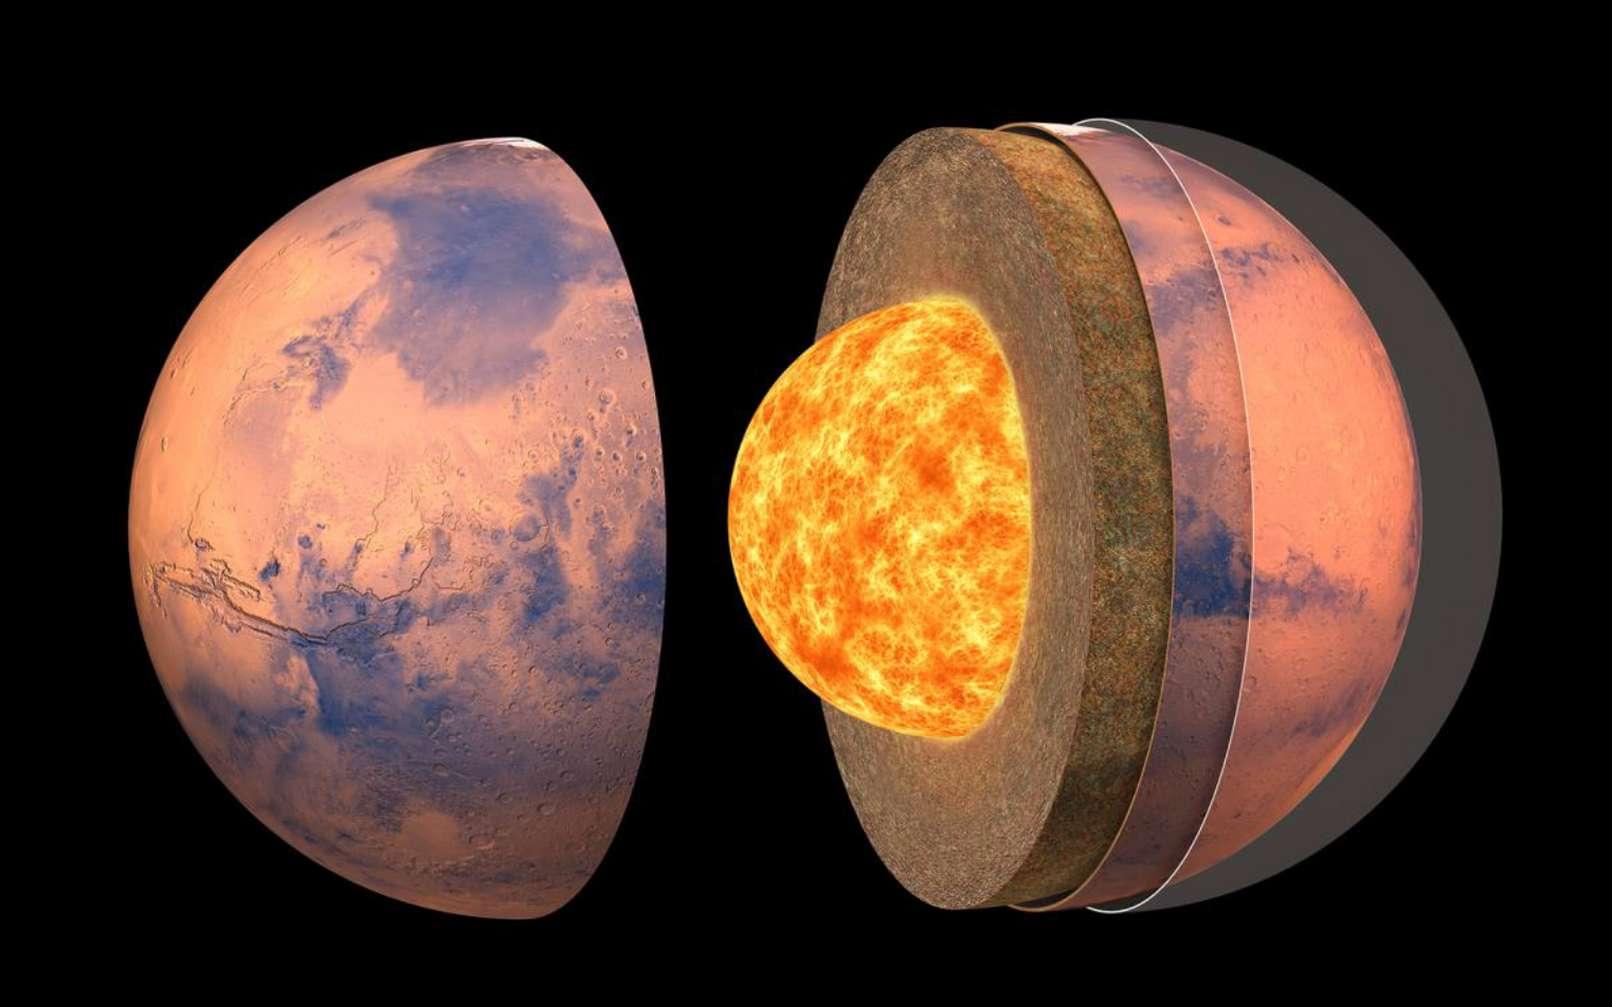 Vue d'artiste de la structure interne de Mars. © IPGP, David Ducros